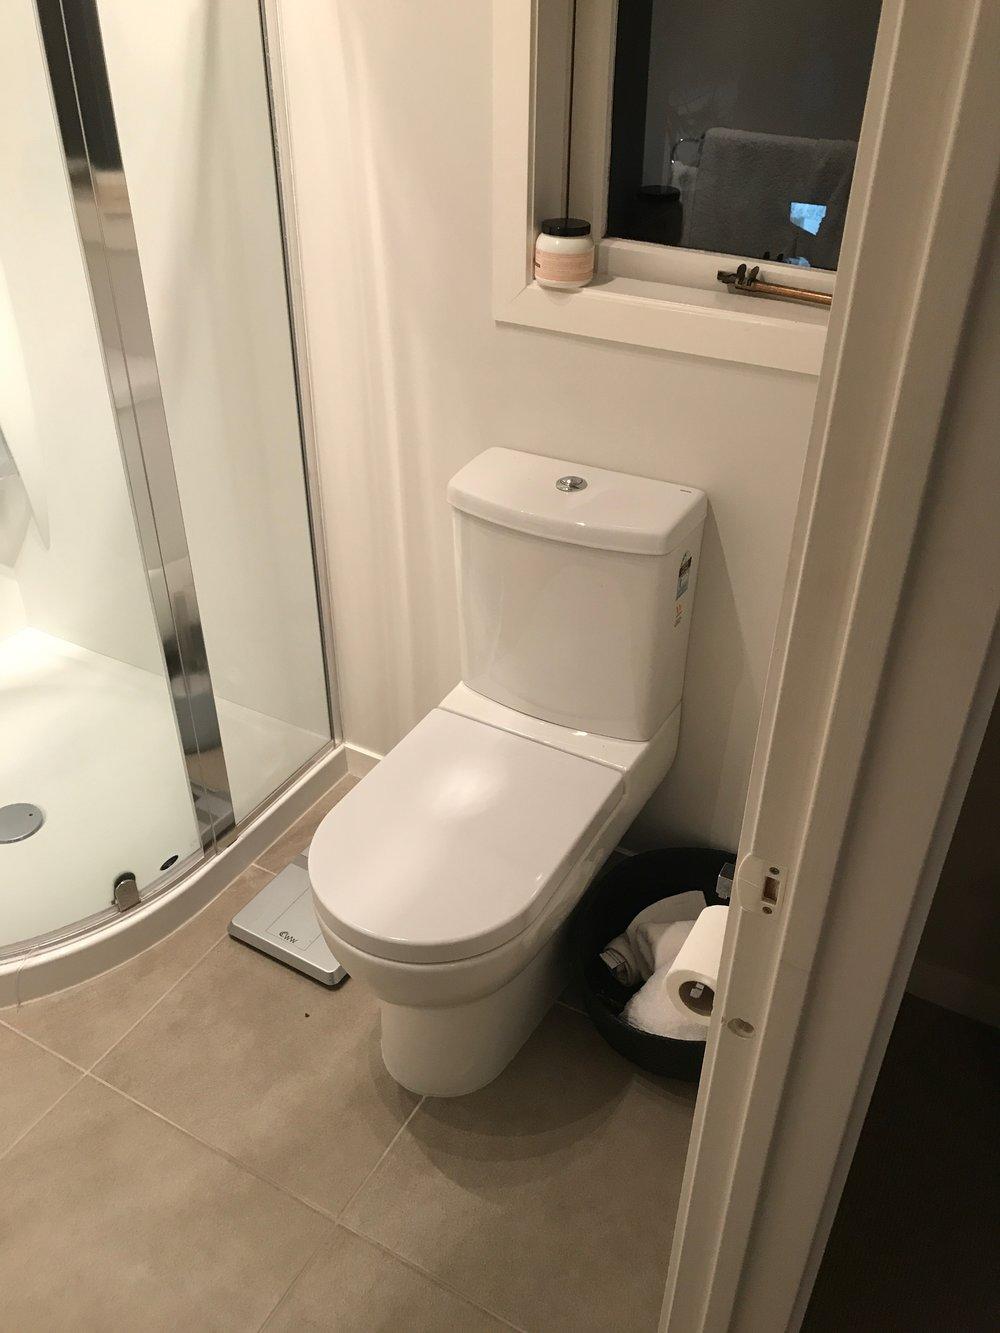 Ellerslie bathroom renovator Auckland. Ensuite toilet and tiled floor . Bathroom Renovation by E J Building Bathroom renovators In Auckland.